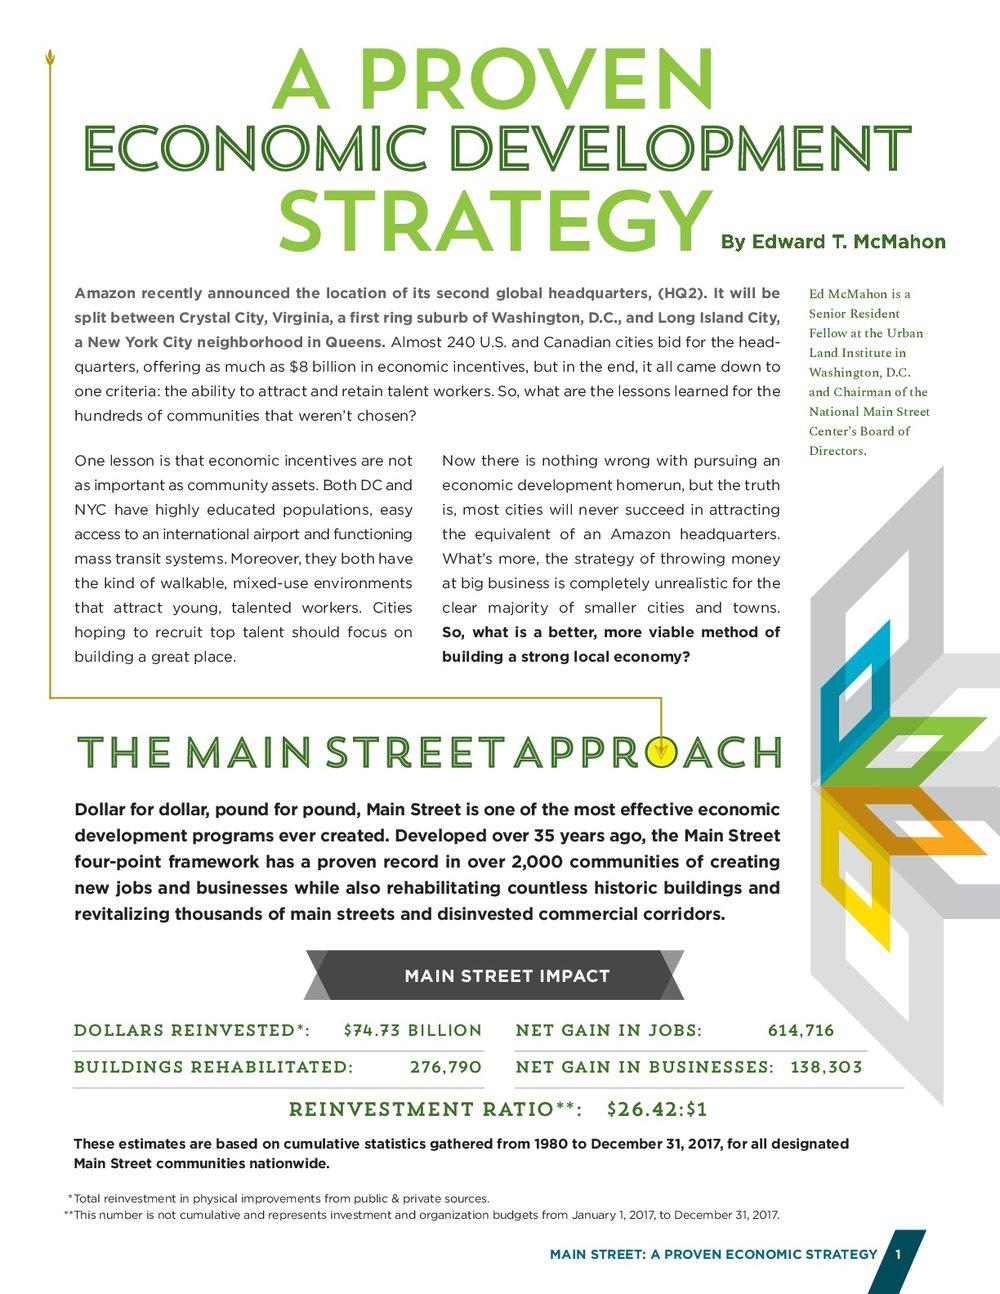 Main_Street_A_Proven_Economic_Development_Strategy-001[1].jpg